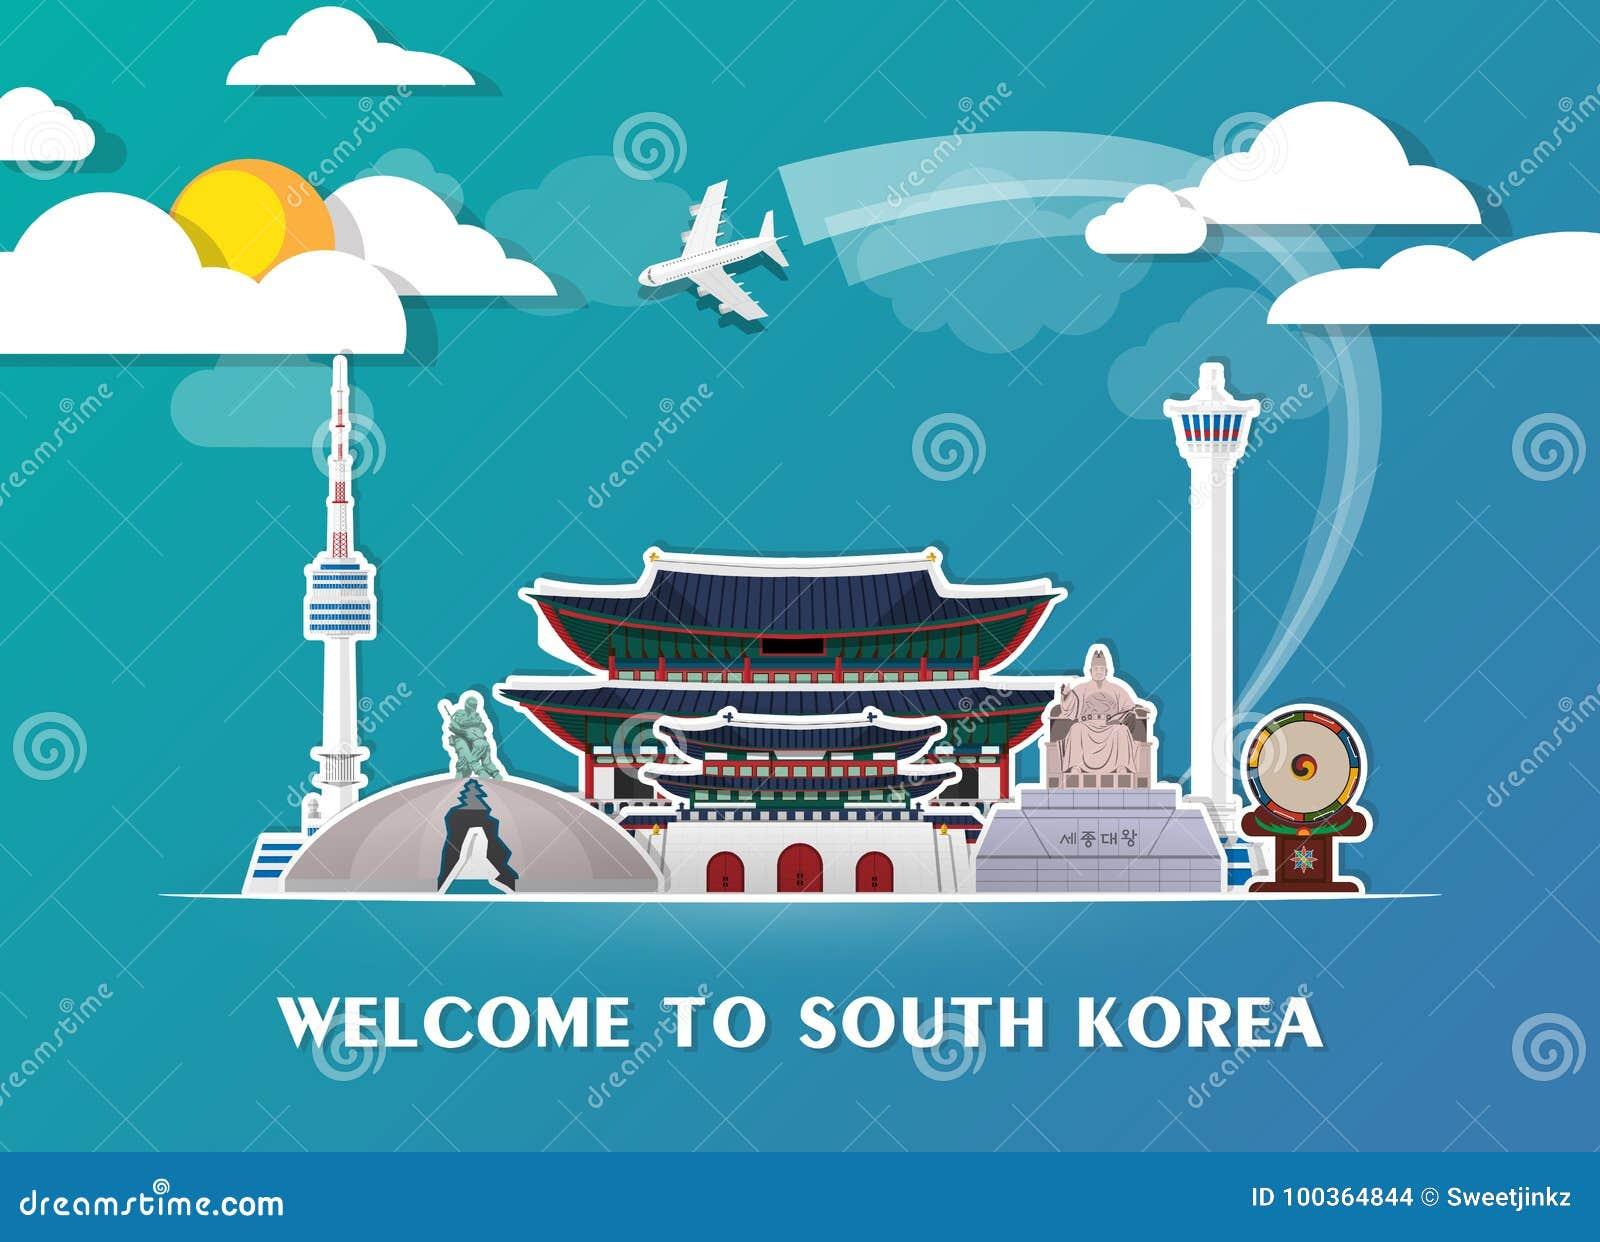 South Korea Landmark Global Travel And Journey Paper Background